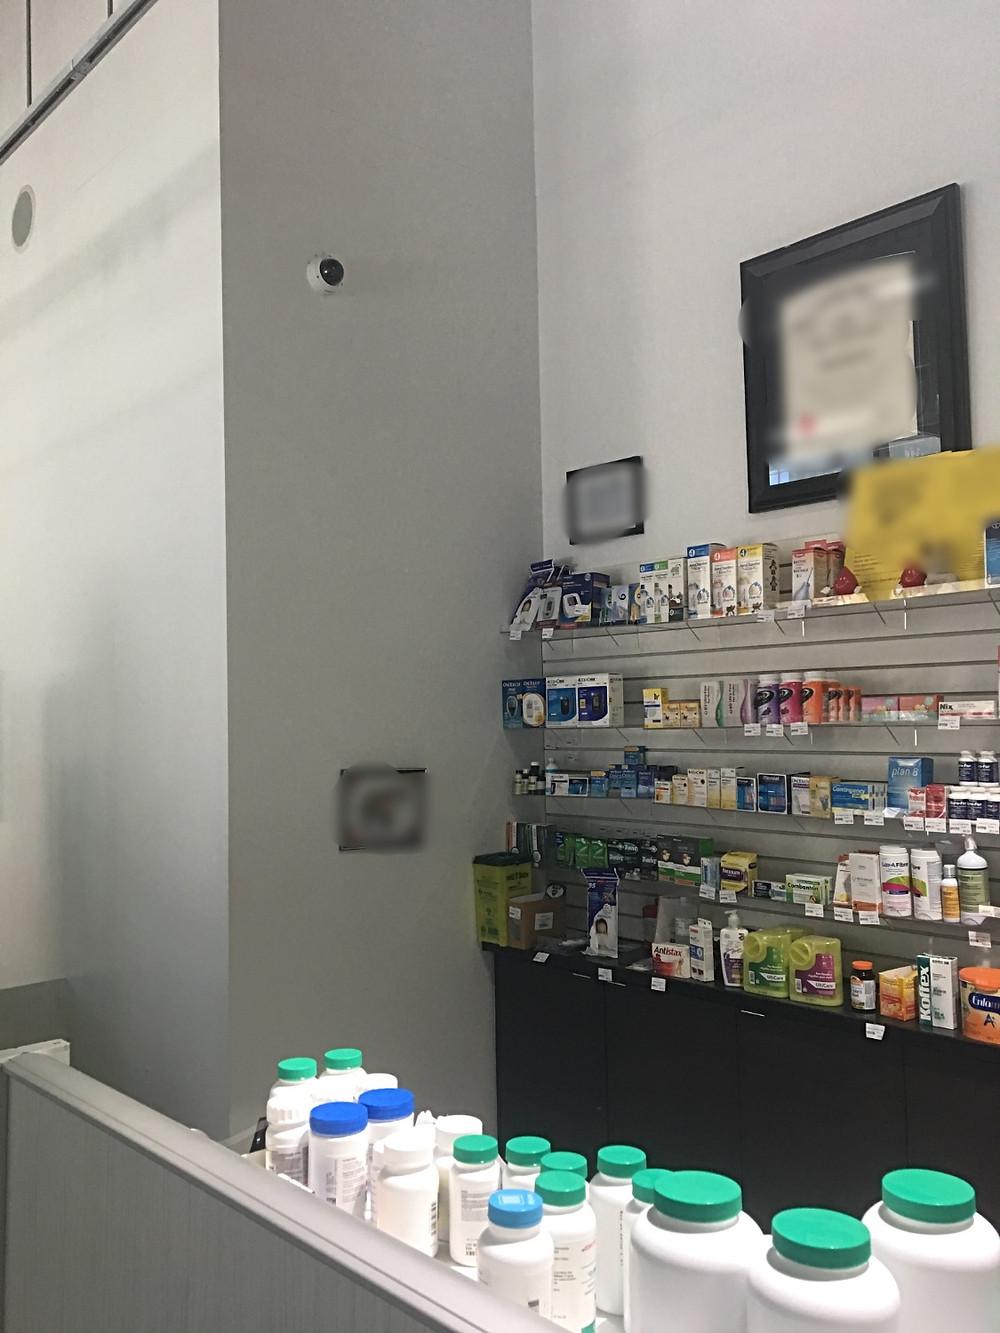 Security camera viewing medicine dispensary